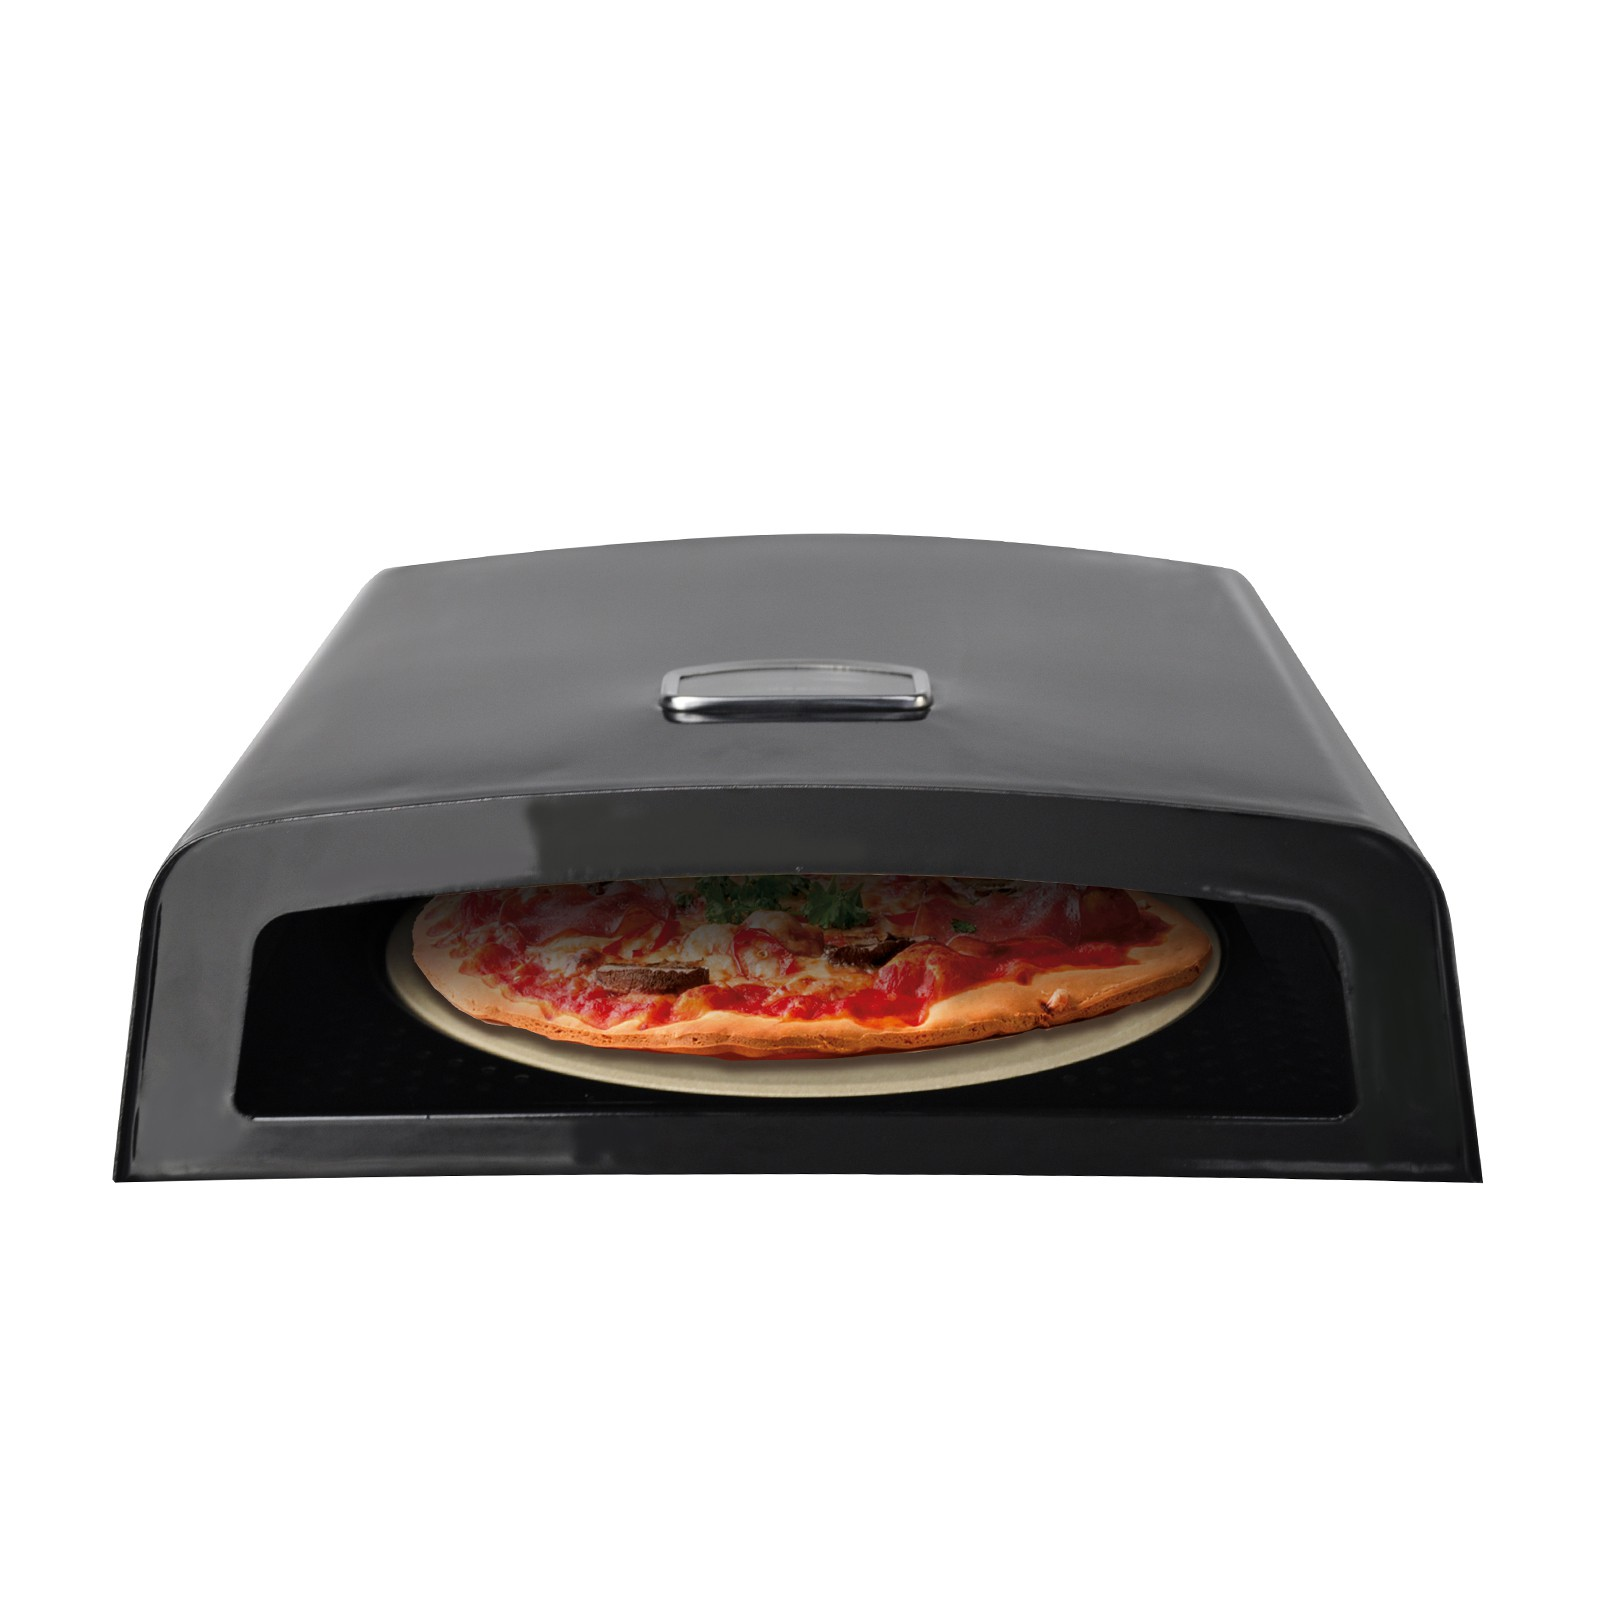 Tepro Pizza Box Grillkamin Ø 30 cm 8317